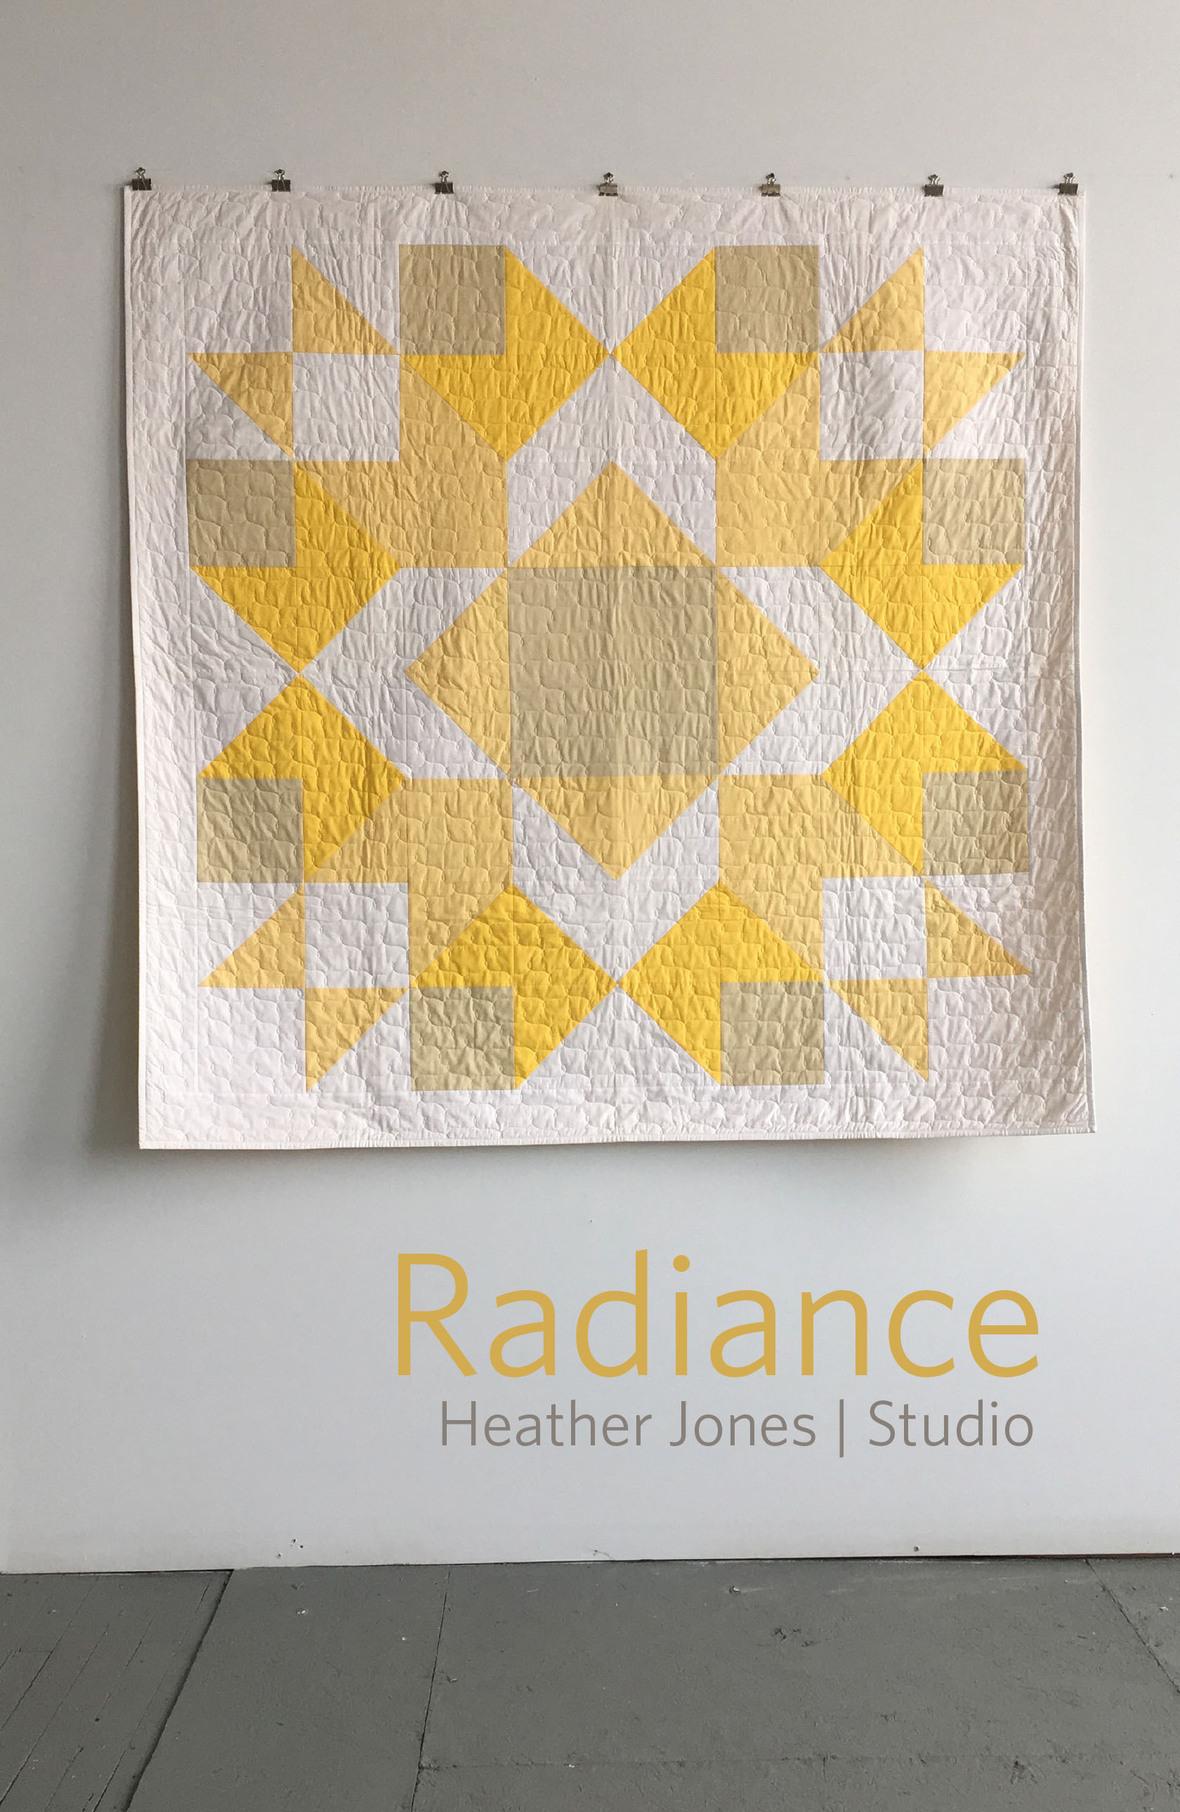 heather jones radiance sewing pattern  1